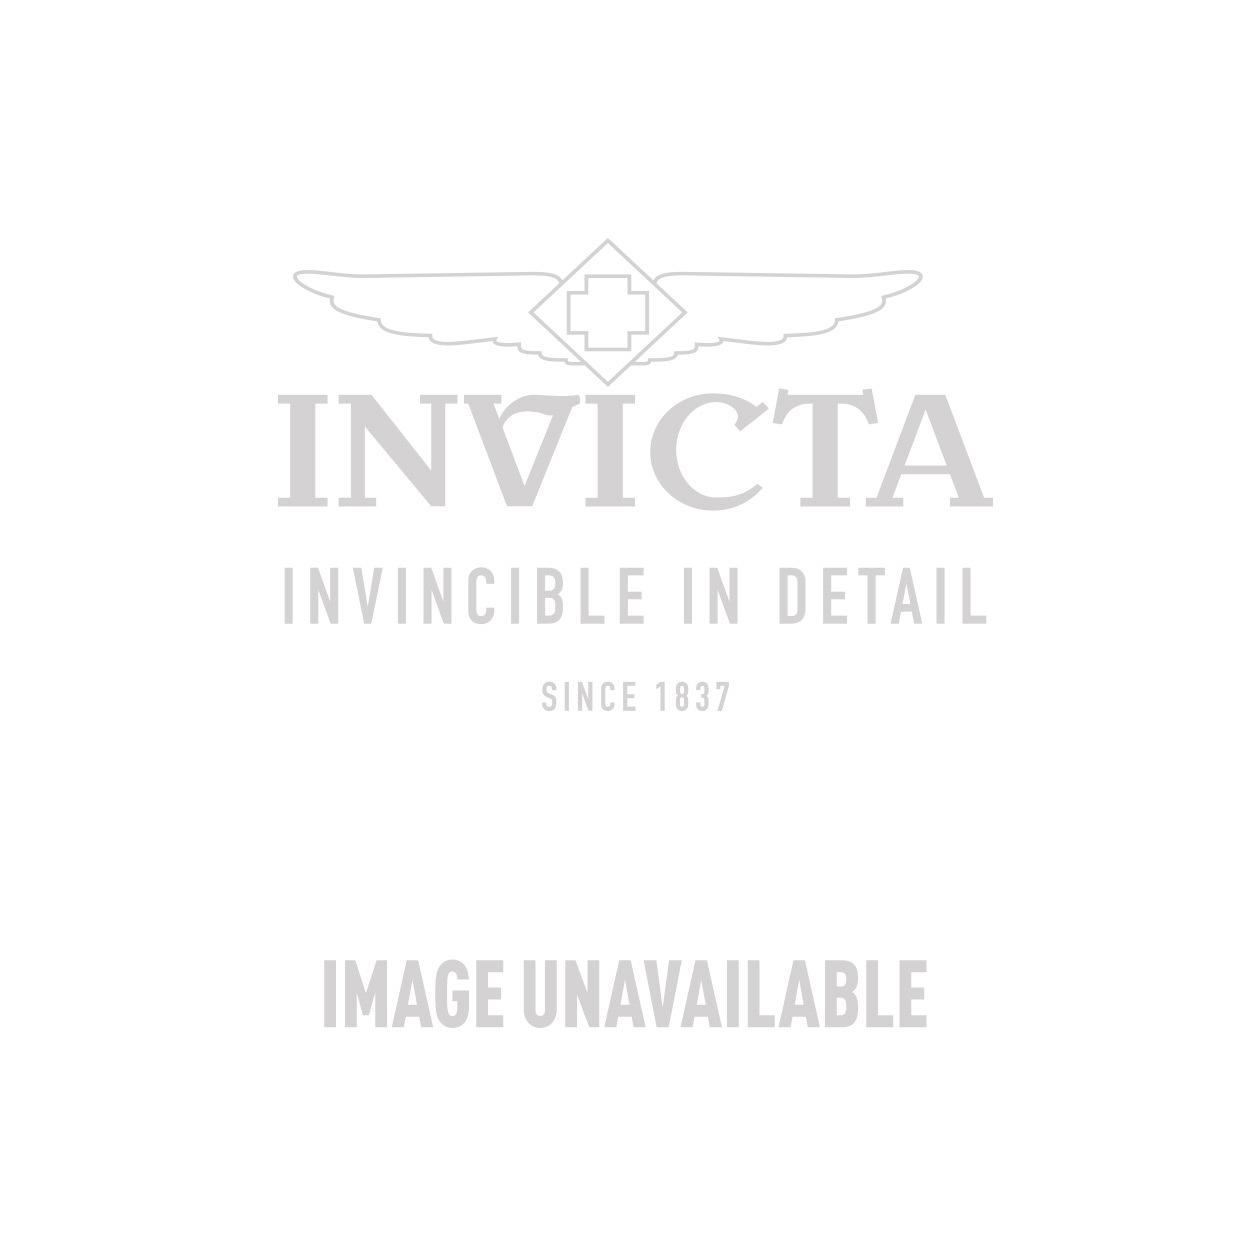 Invicta Corduba Swiss Movement Quartz Watch - Gunmetal, Stainless Steel case Stainless Steel band - Model 18866